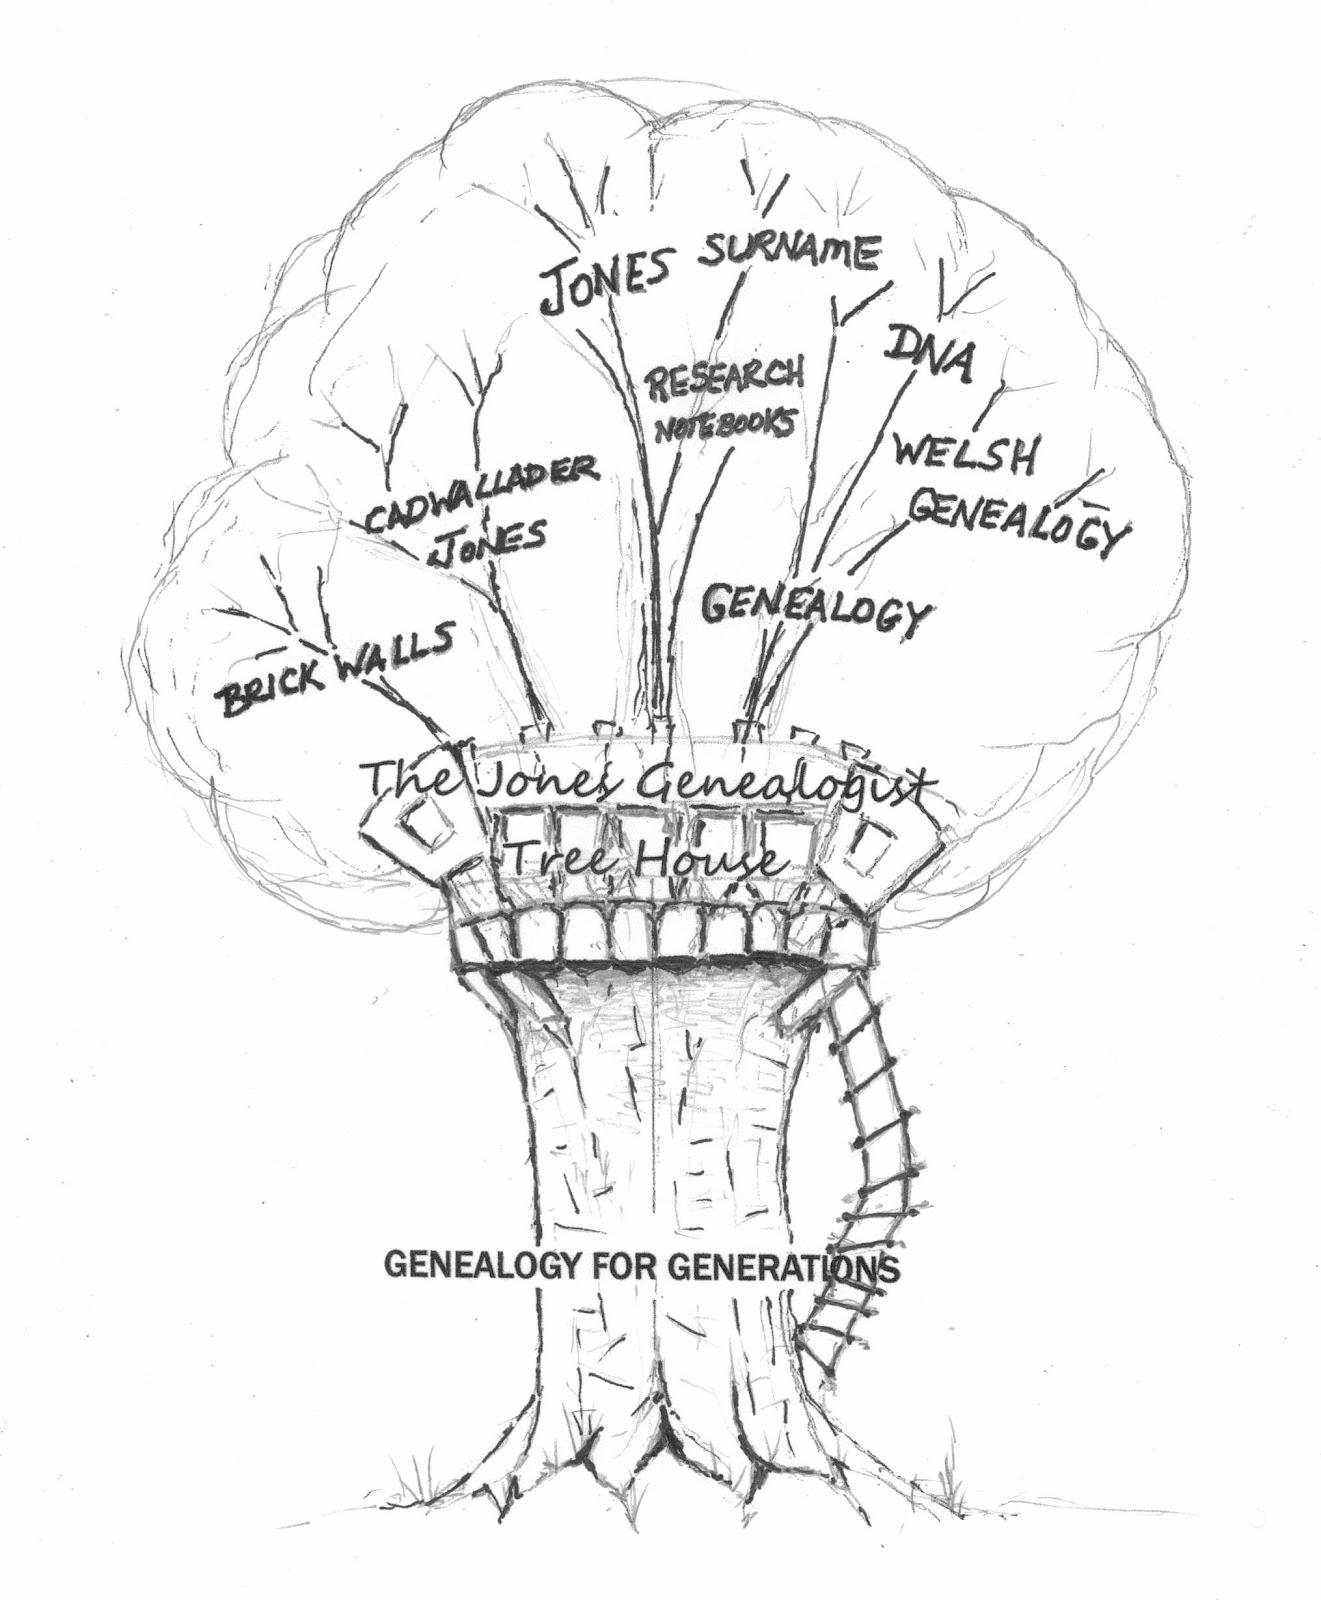 1321x1600 The Jones Genealogist My Genealogy Tree House